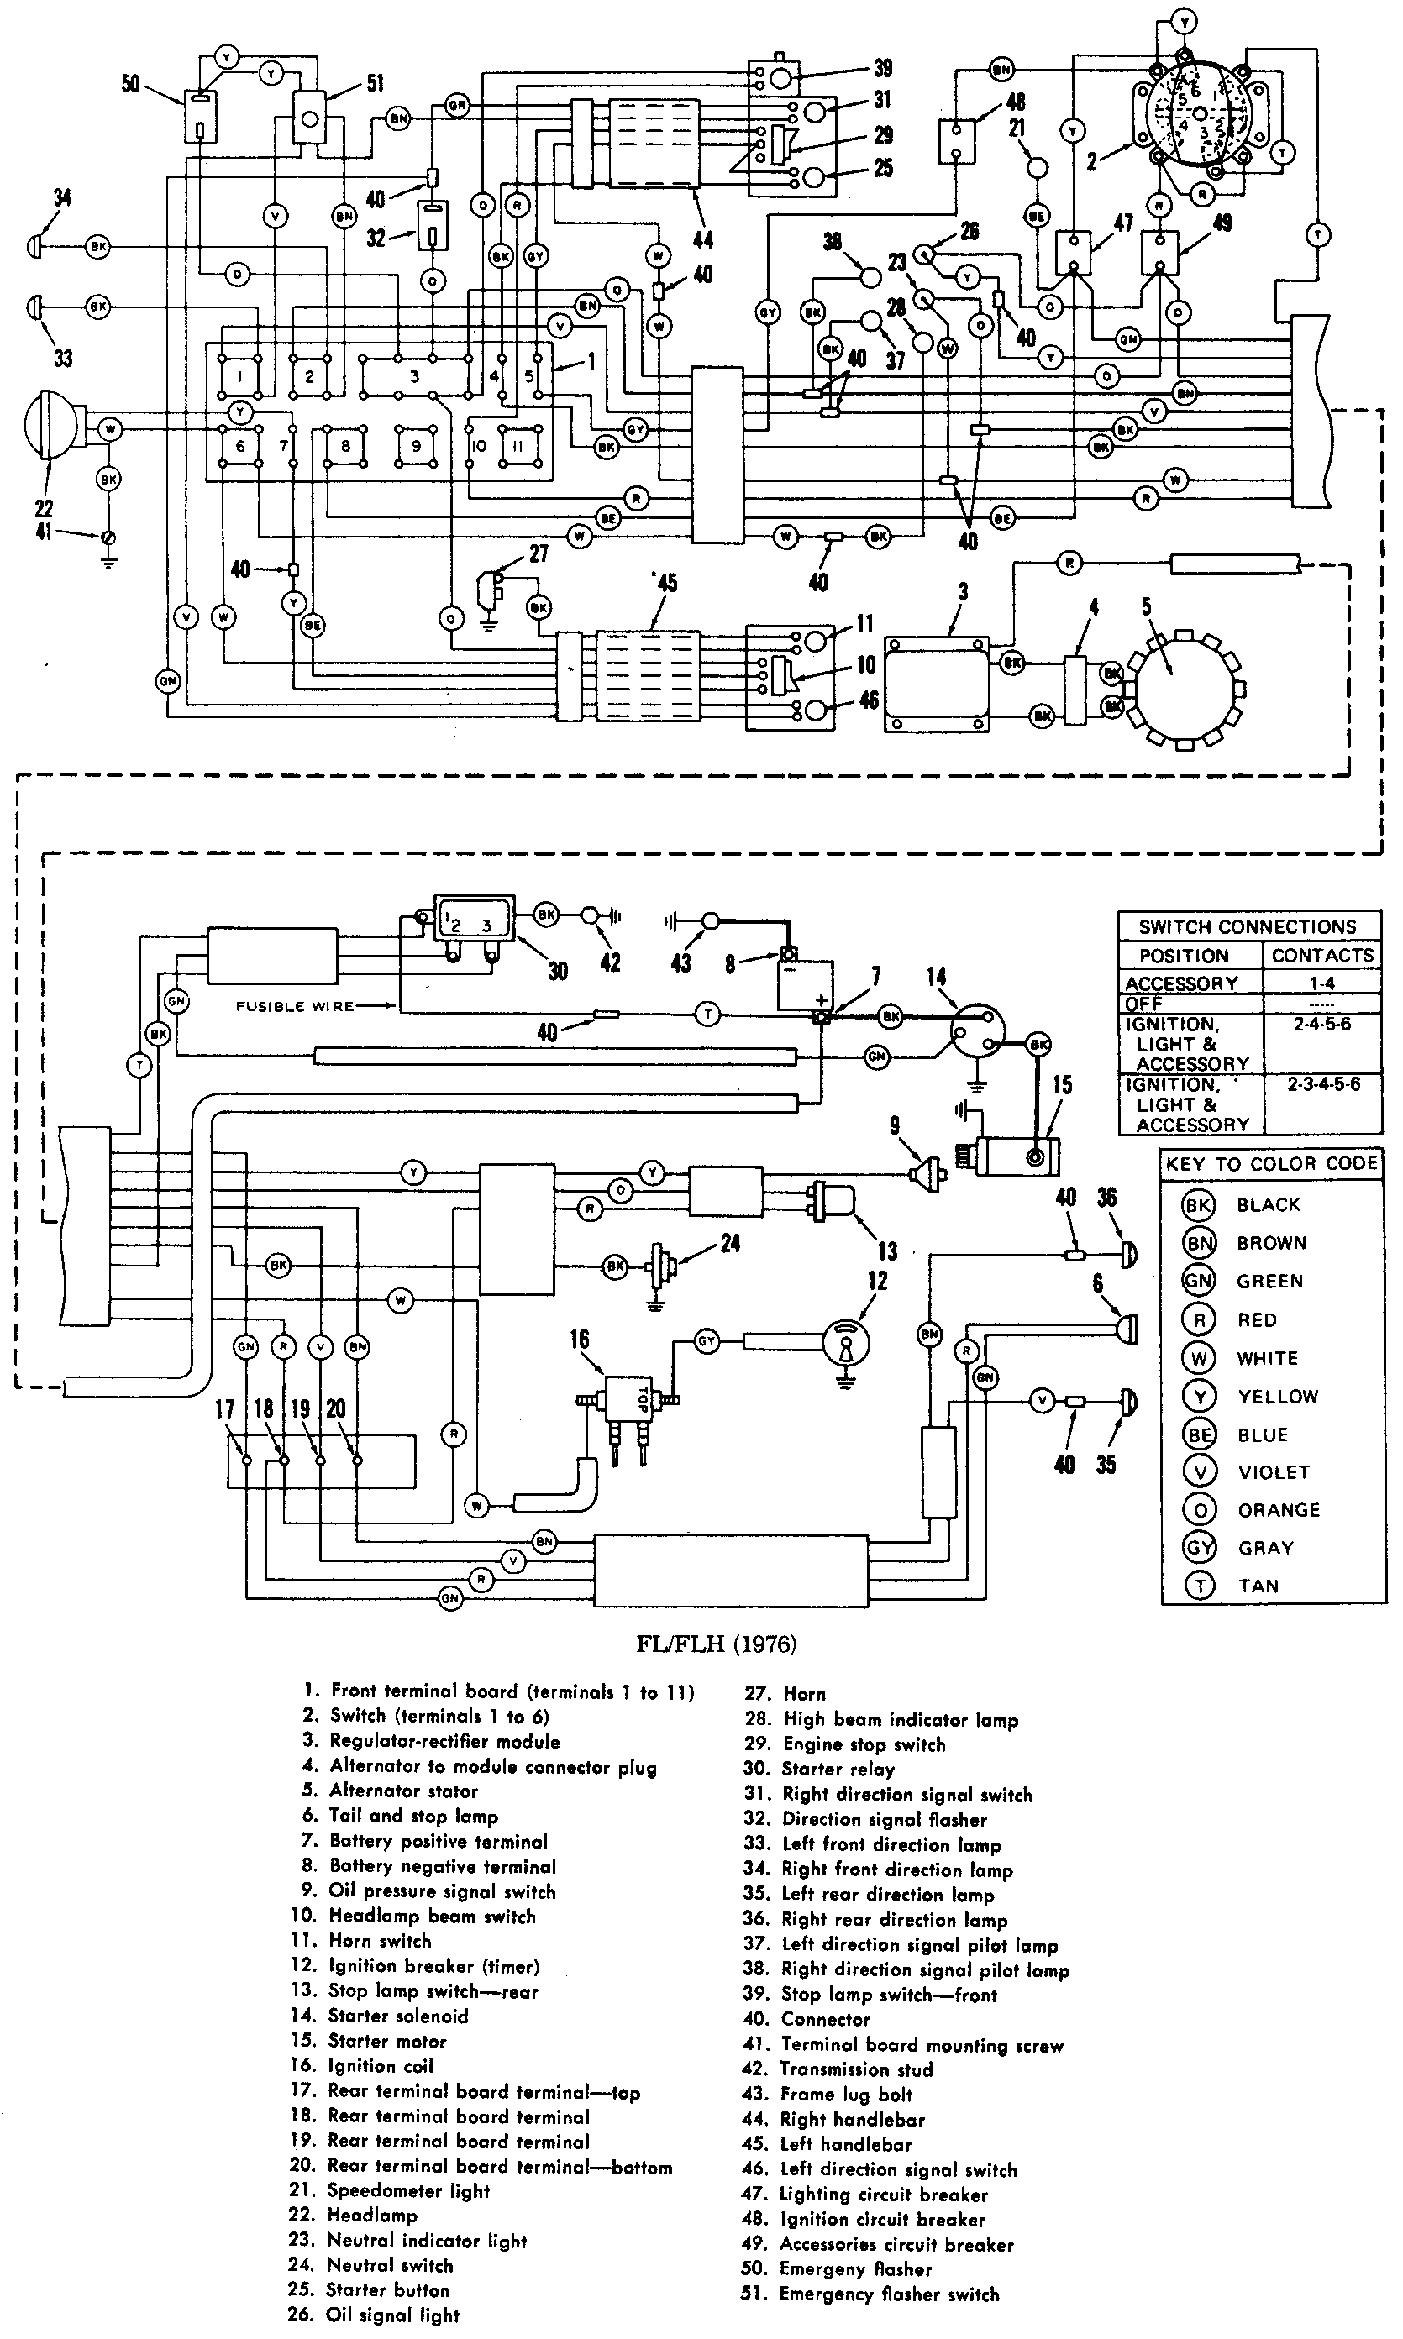 Harley Davidson Radio Wiring Diagram Harley Davidson Radio Wiring Diagram Free About Wiring Diagram and Of Harley Davidson Radio Wiring Diagram